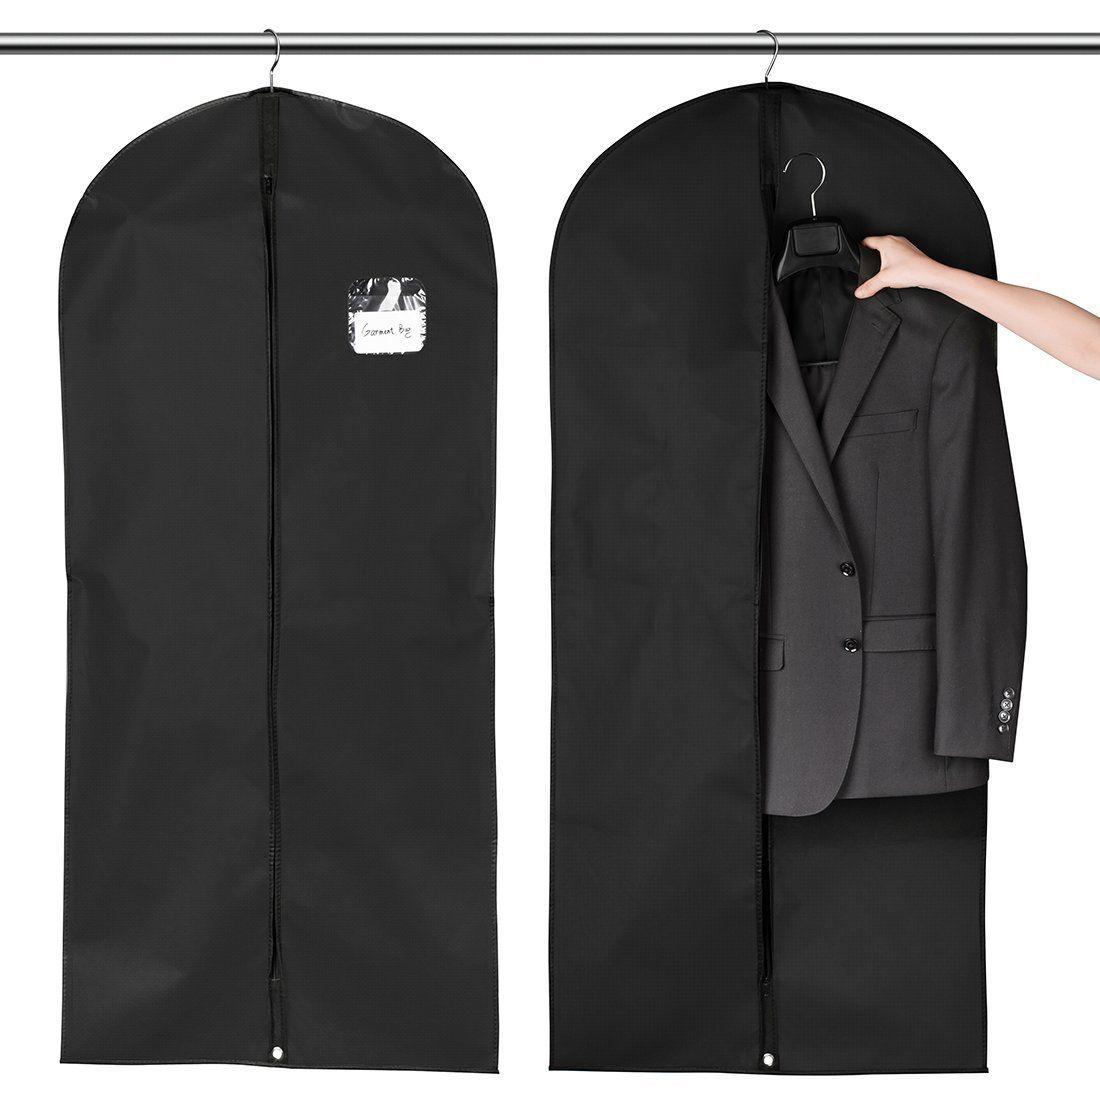 FU GLOBAL Garment Bag Breathable Suit Bag